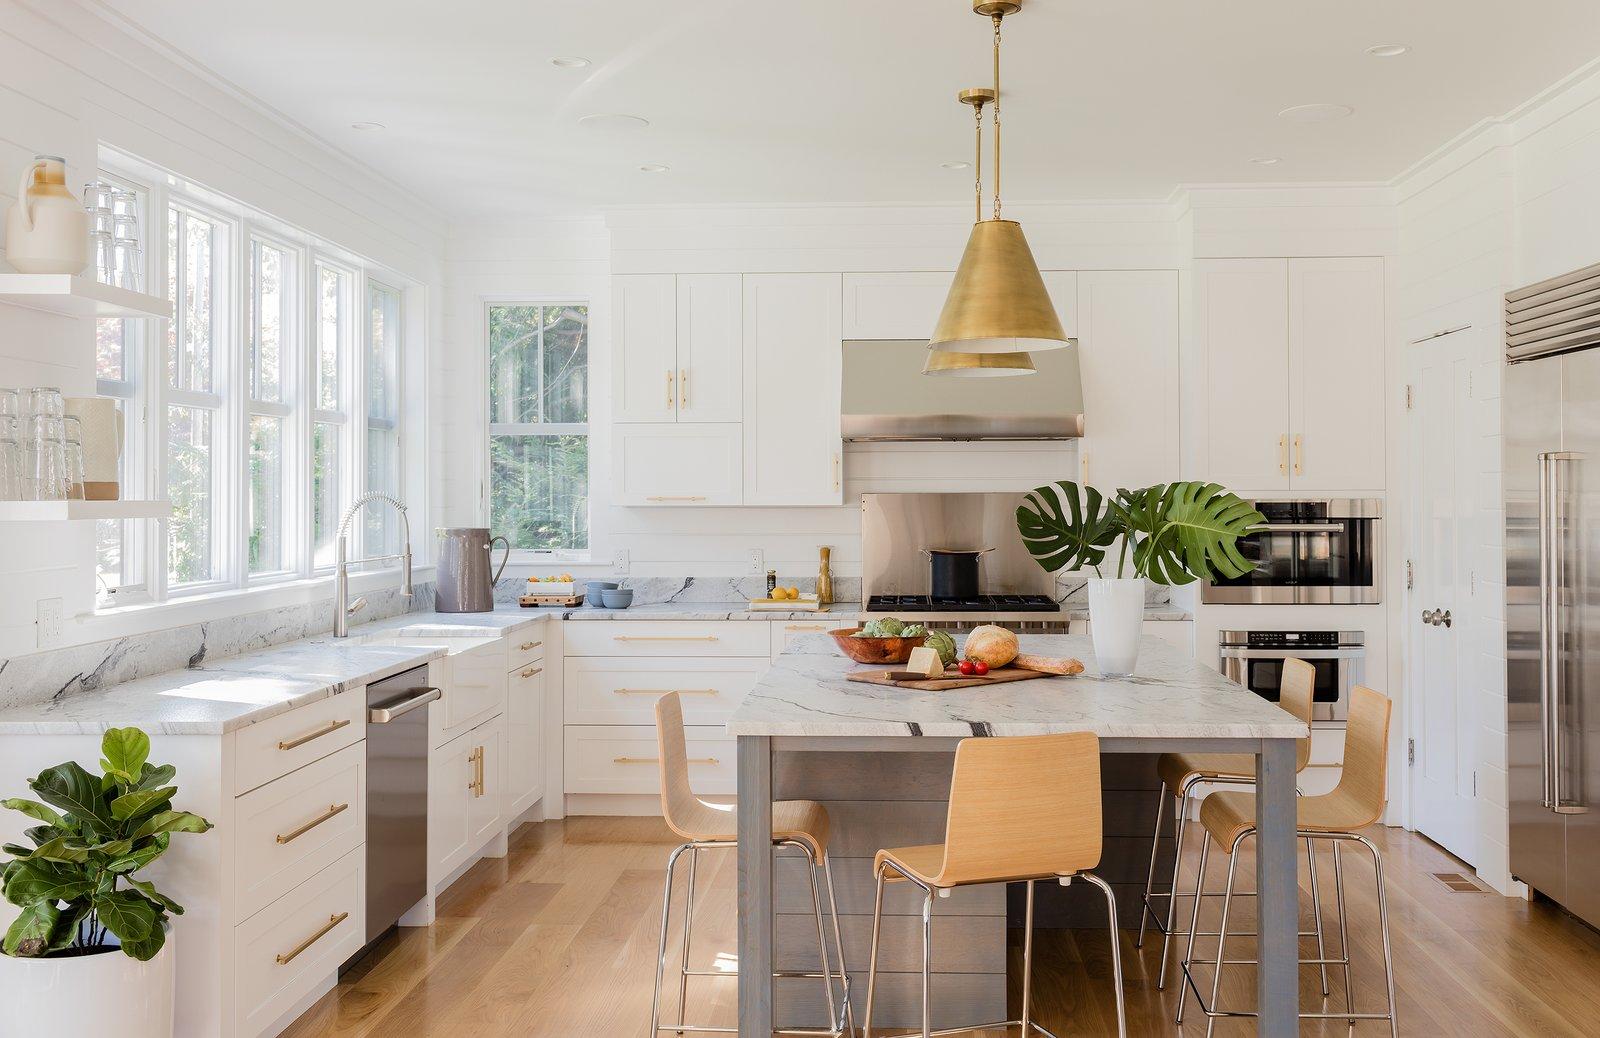 Midcentury Style Farmhouse kitchen